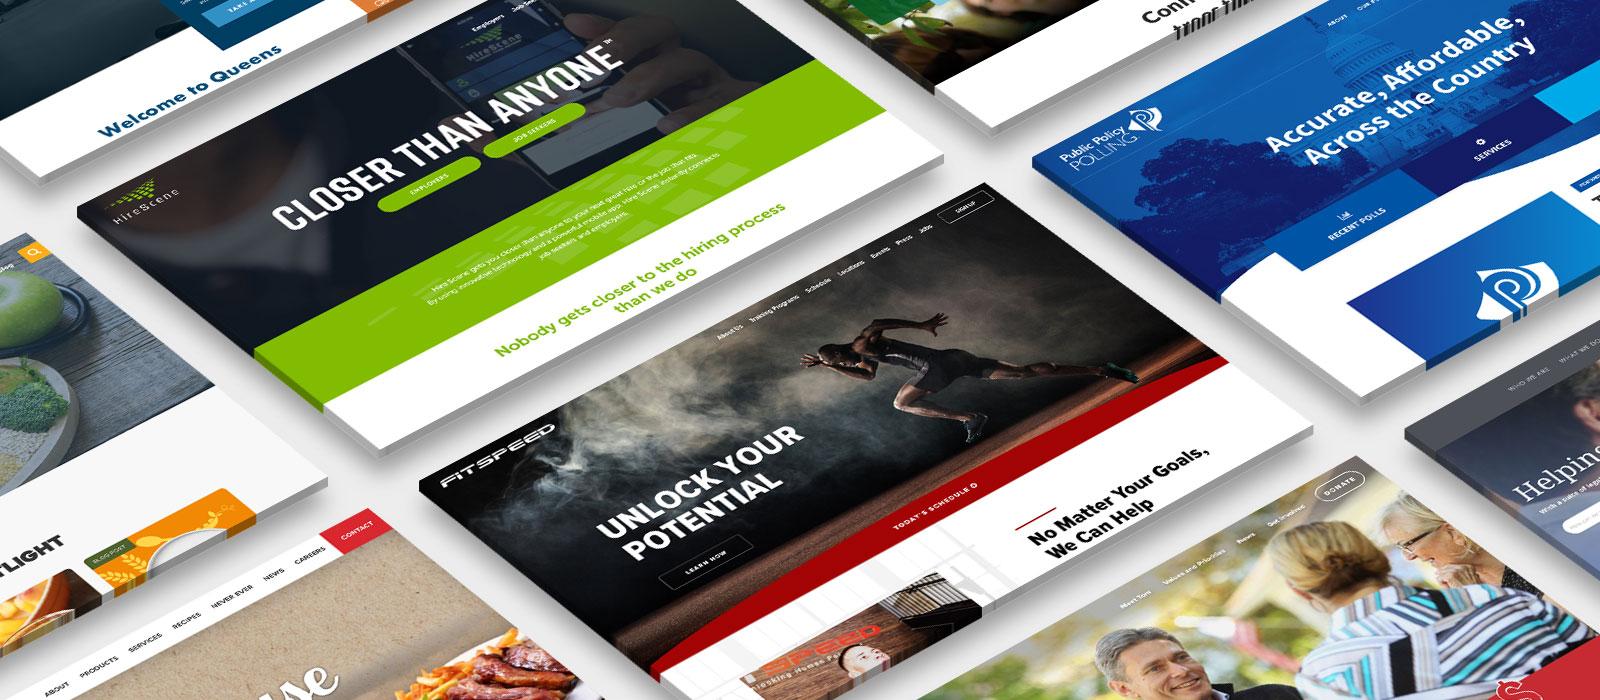 nmc s best websites of 2017